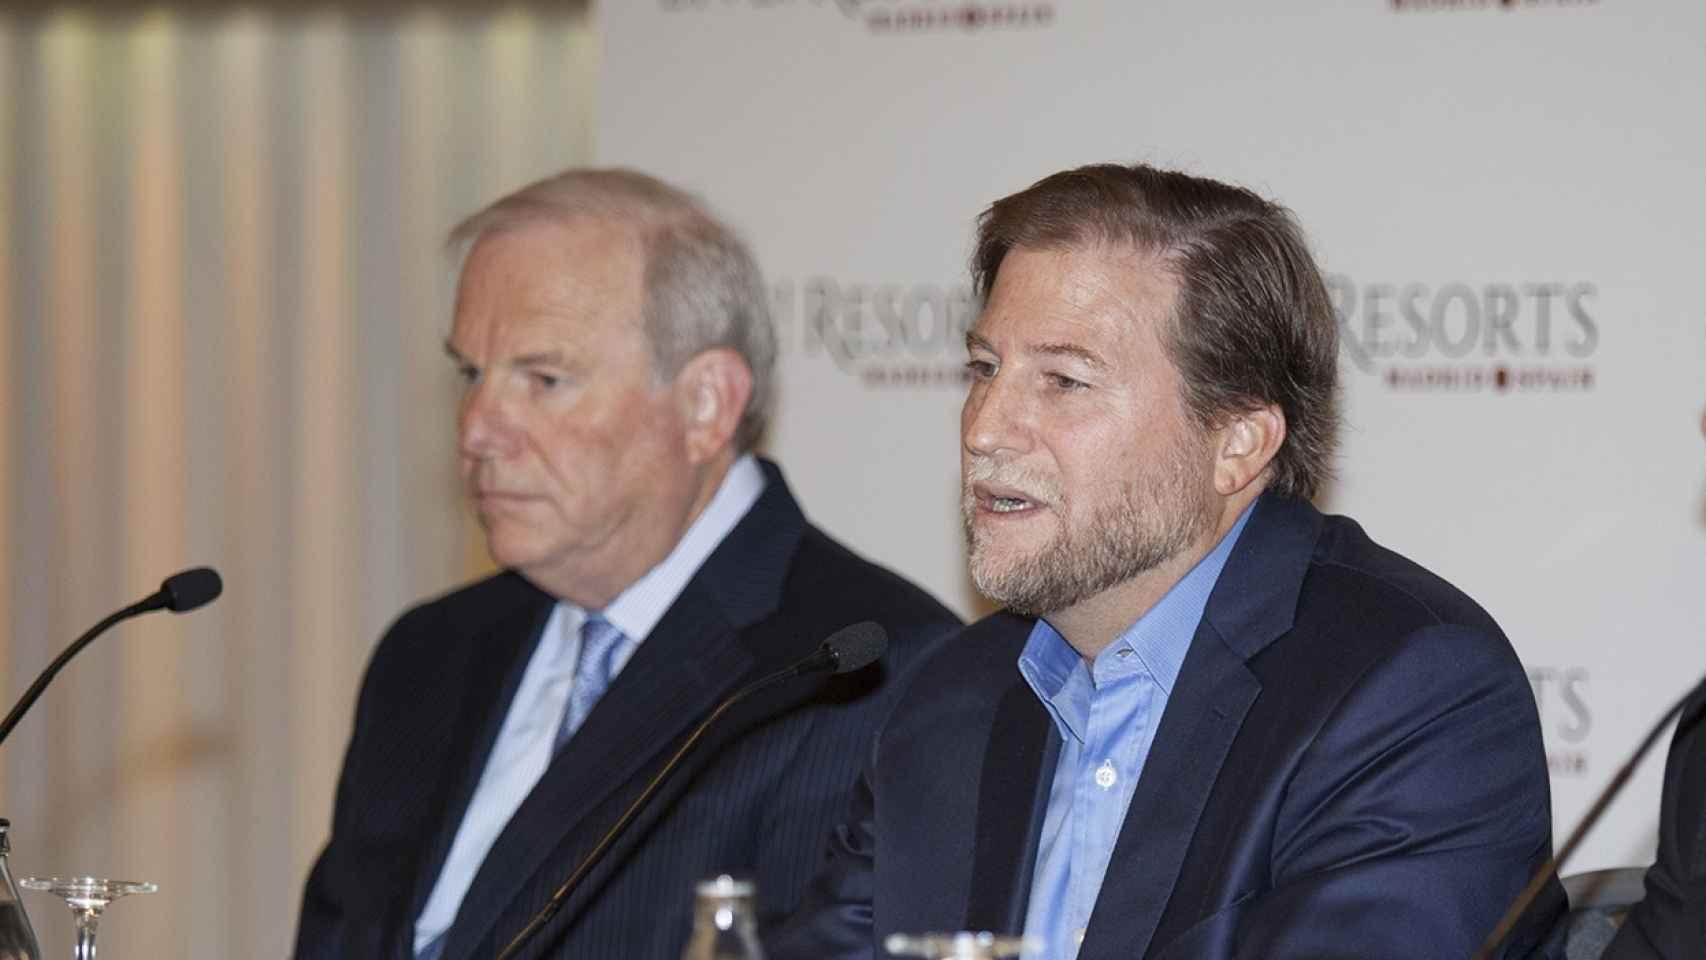 Abe Rosenthal, vicepresidente de desarrollo del grupo, junto al CEO, Joseph Weinberg.